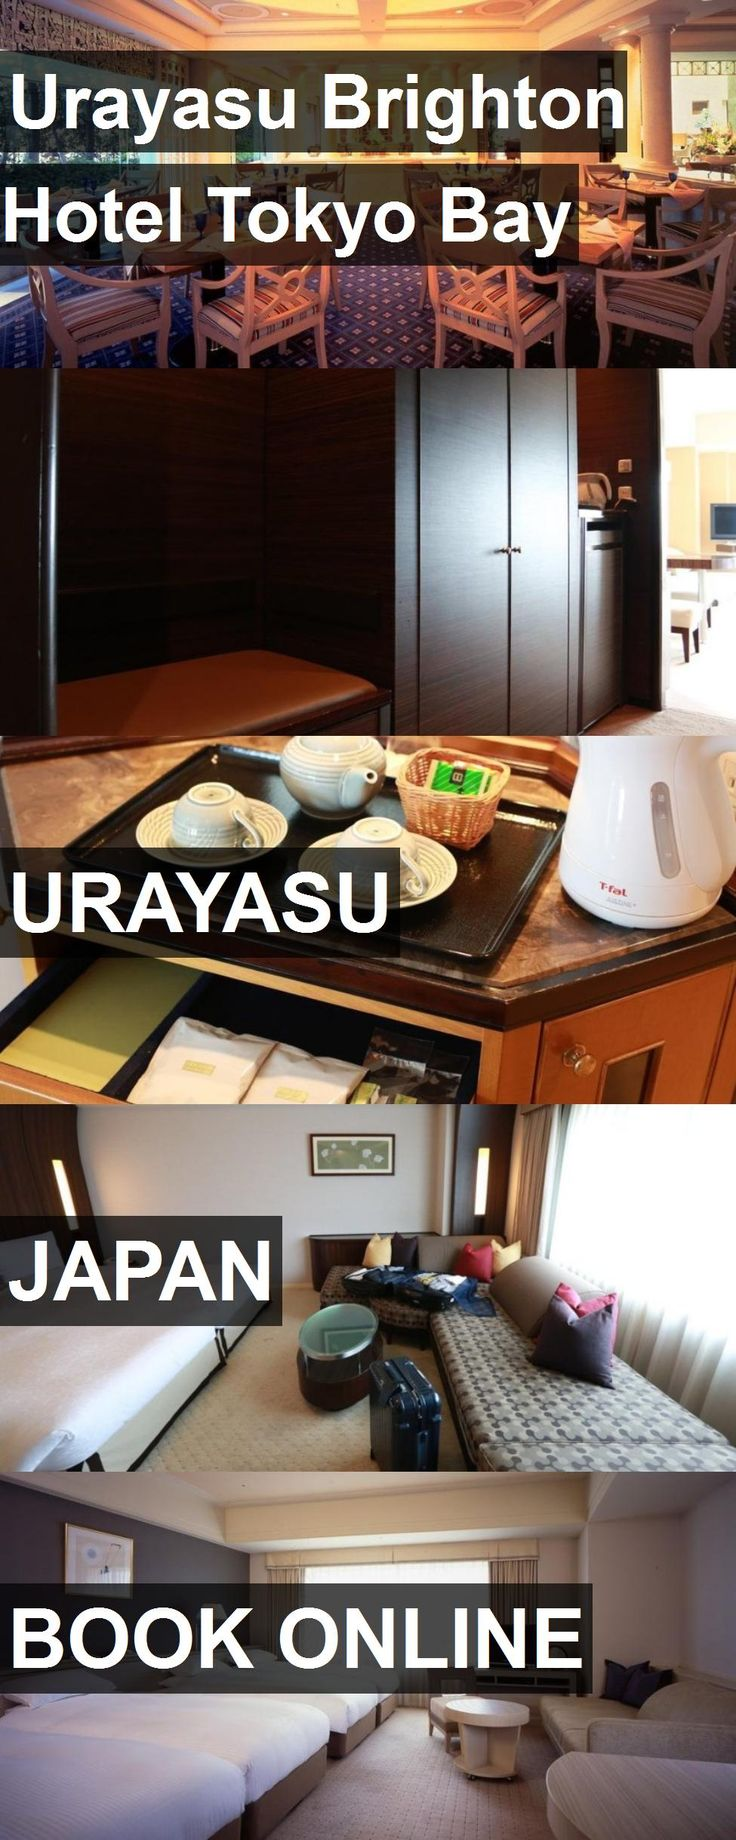 Hotel Urayasu Brighton Hotel Tokyo Bay in Urayasu, Japan. For more information, photos, reviews and best prices please follow the link. #Japan #Urayasu #UrayasuBrightonHotelTokyoBay #hotel #travel #vacation